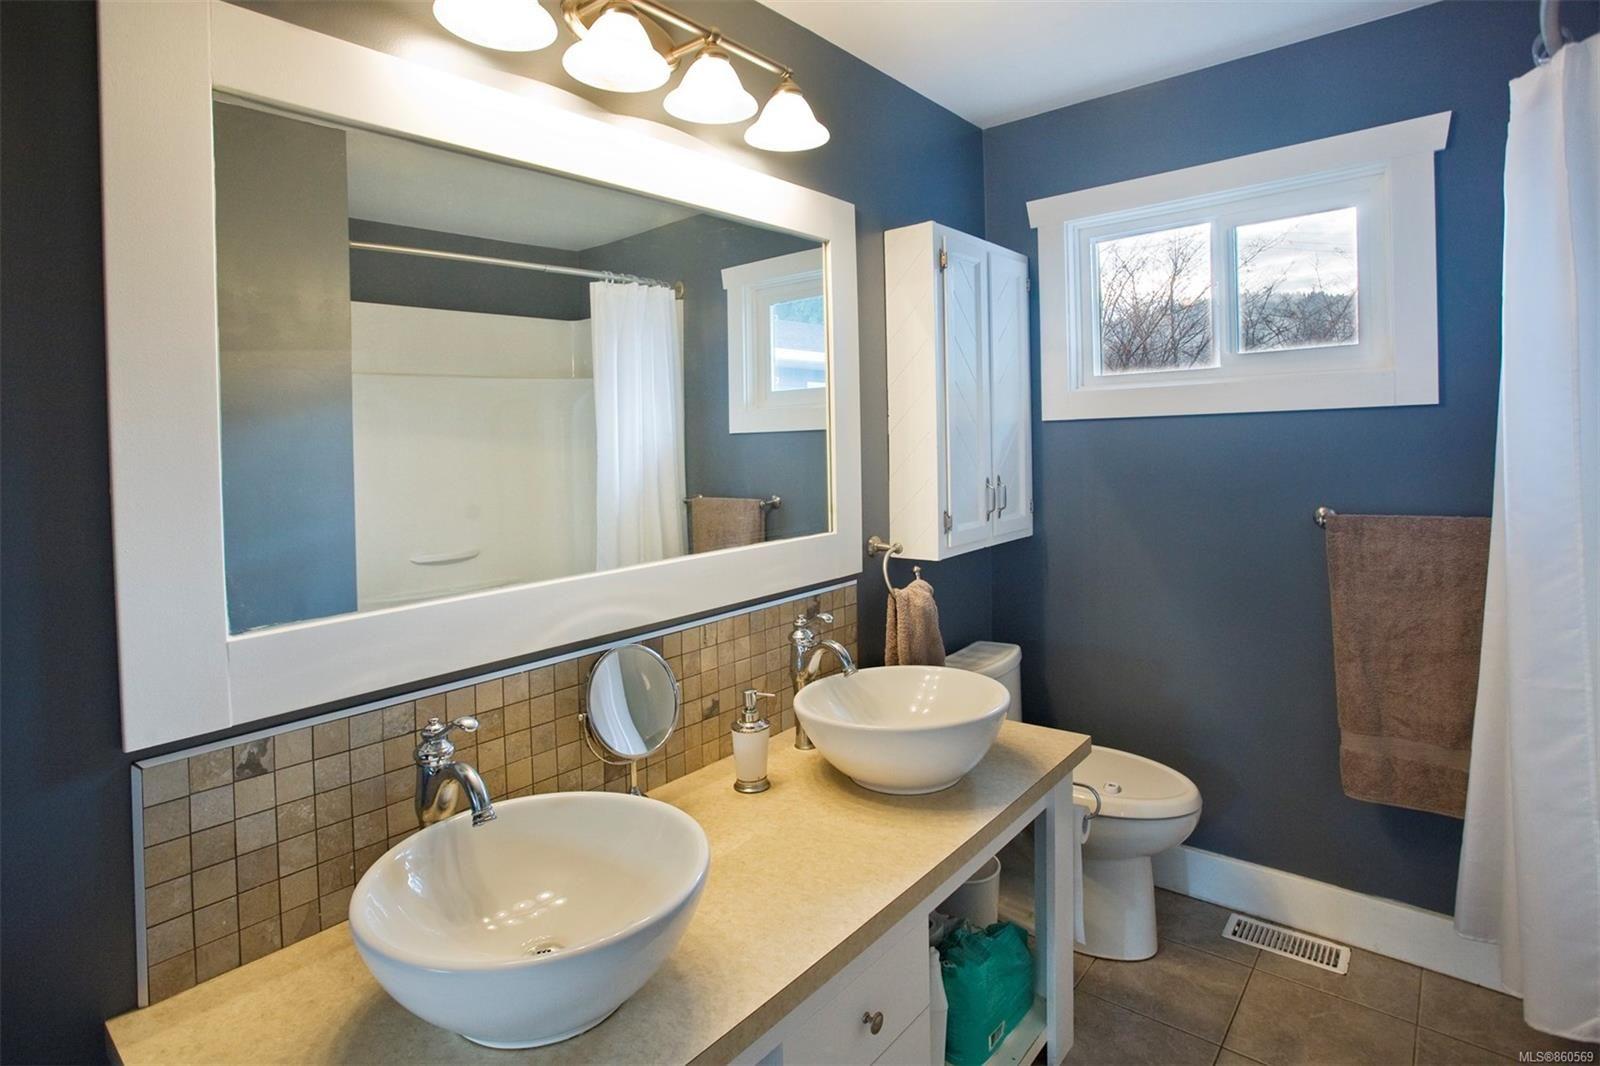 Photo 9: Photos: 4156 Ravenhill Ave in : PA Port Alberni House for sale (Port Alberni)  : MLS®# 860569